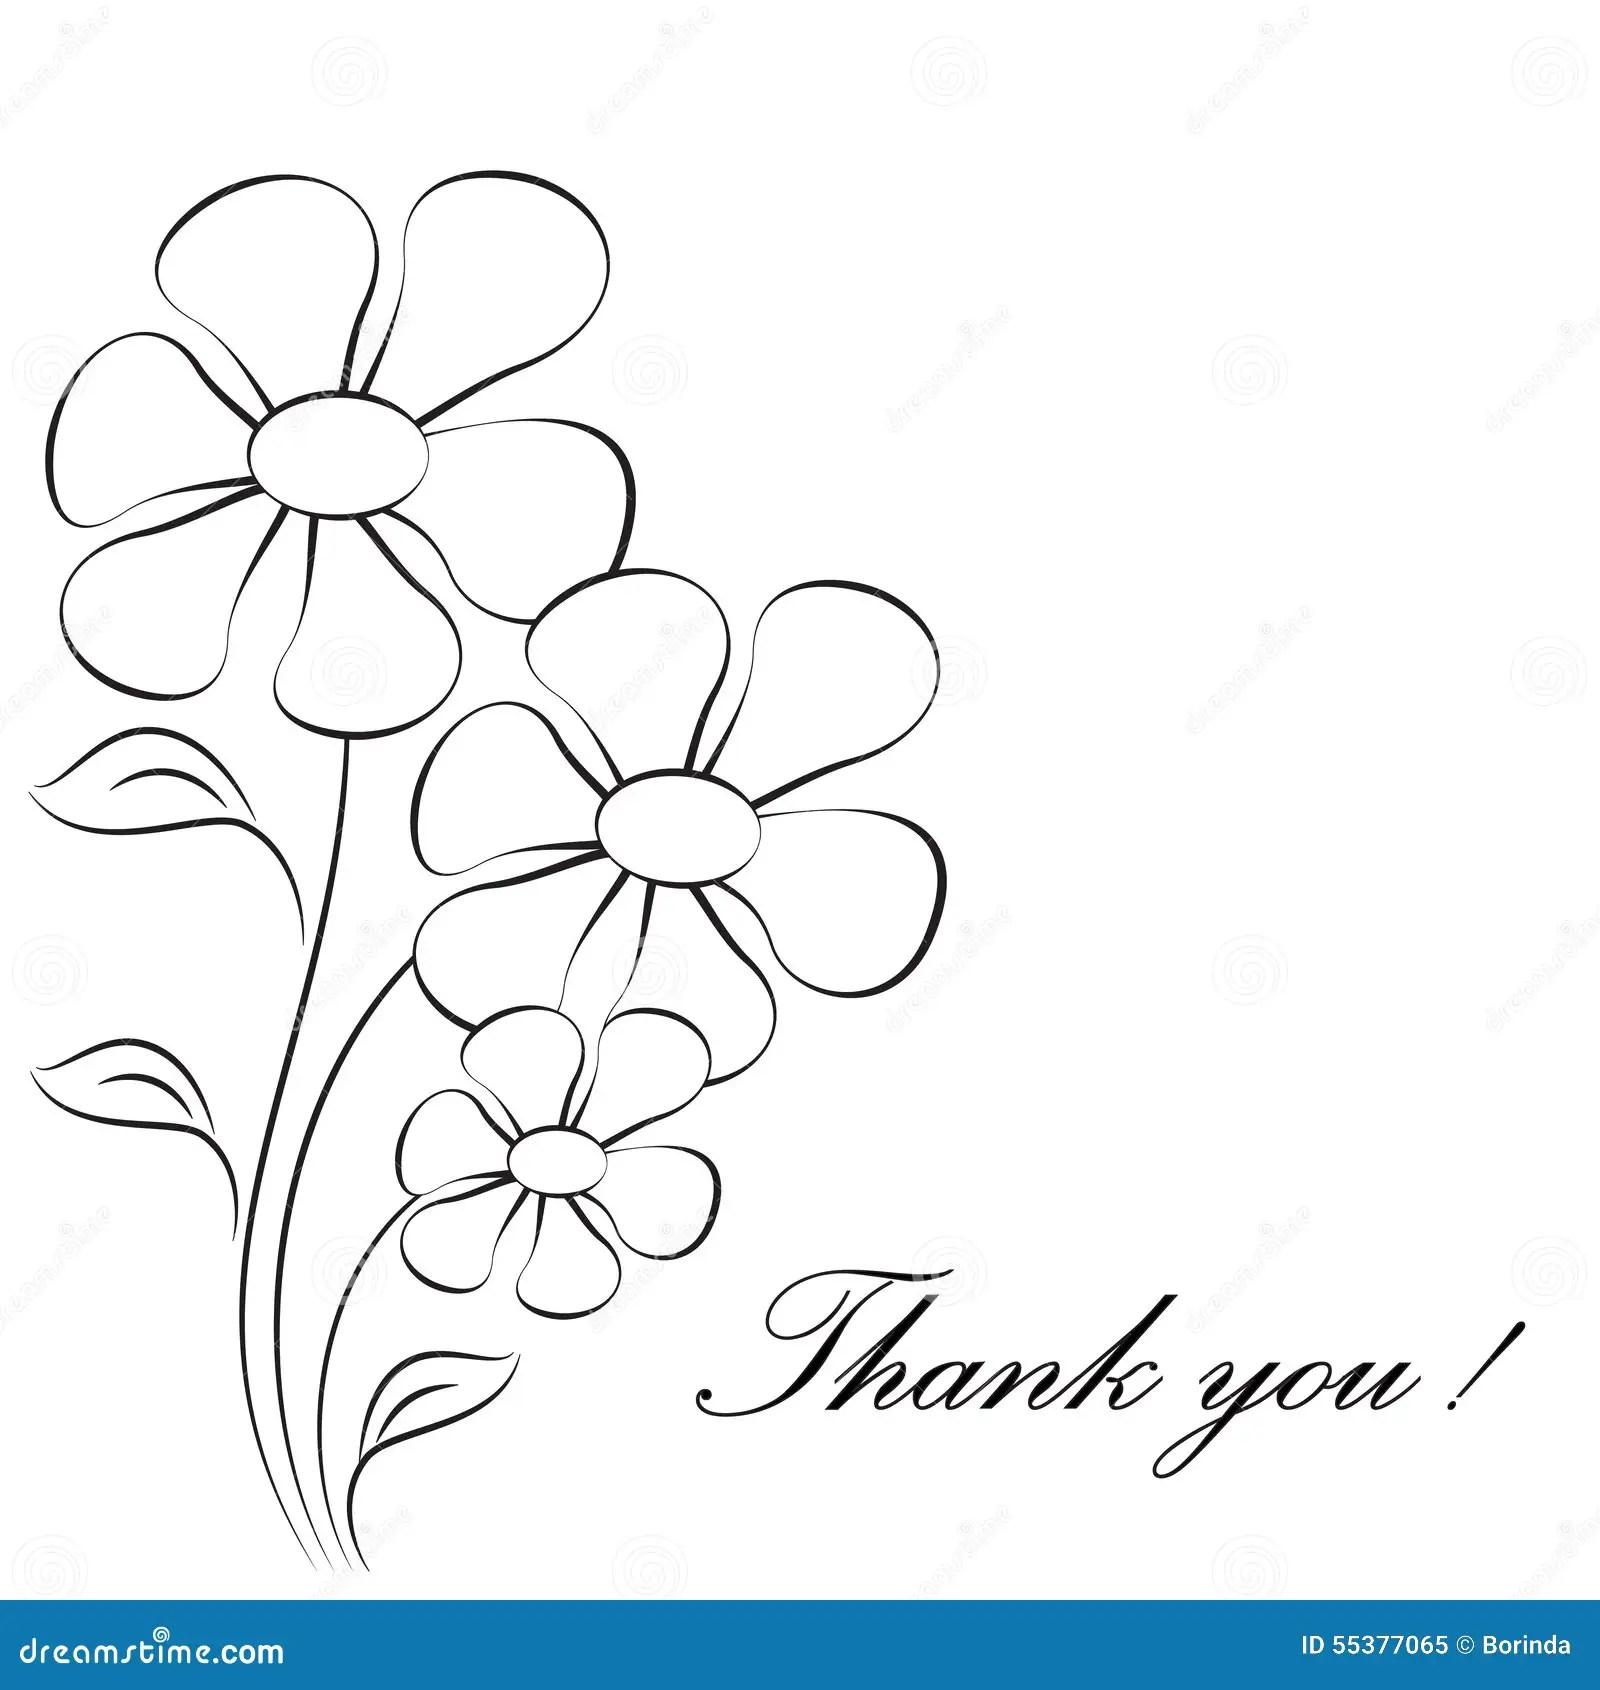 Flower Illustrations, Thank You Card Stock Illustration